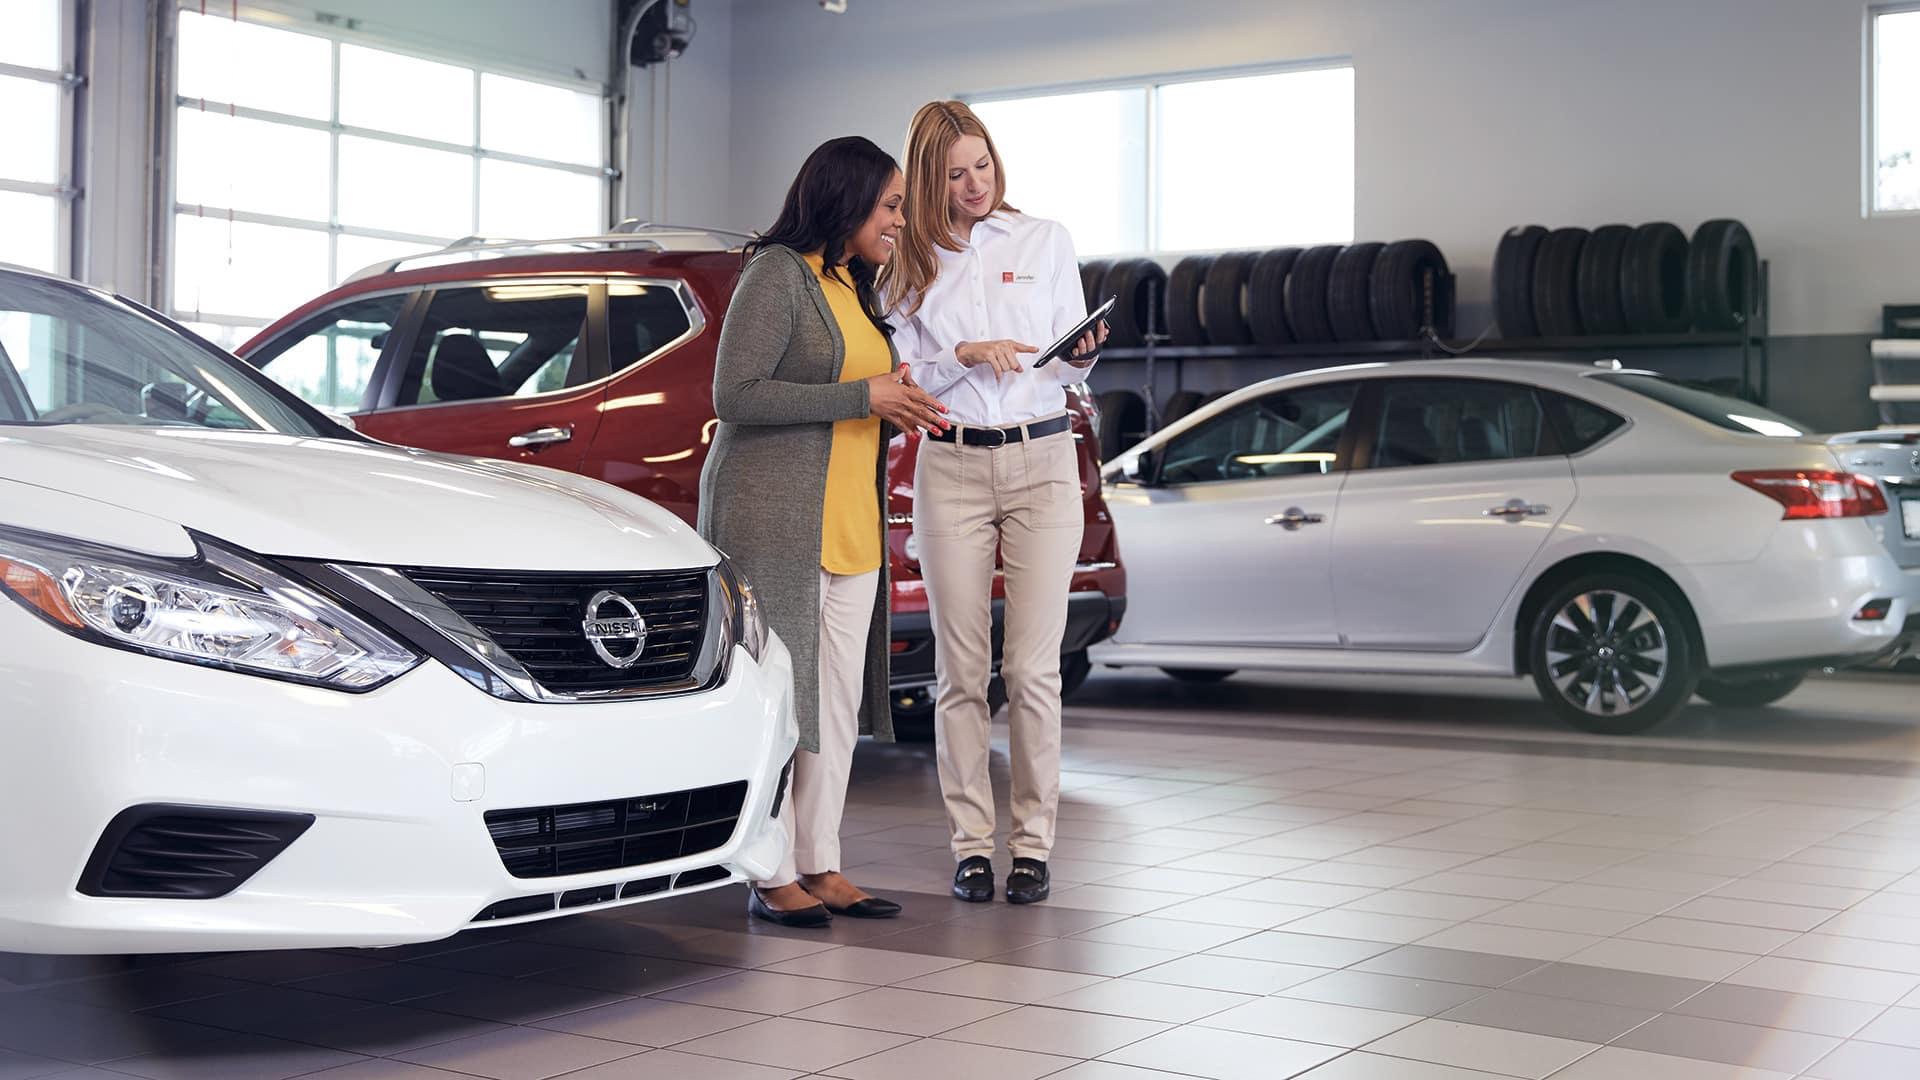 Boch Nissan South is a Family Owned Dealership near Attleboro, MA | Nissan associate helping a customer